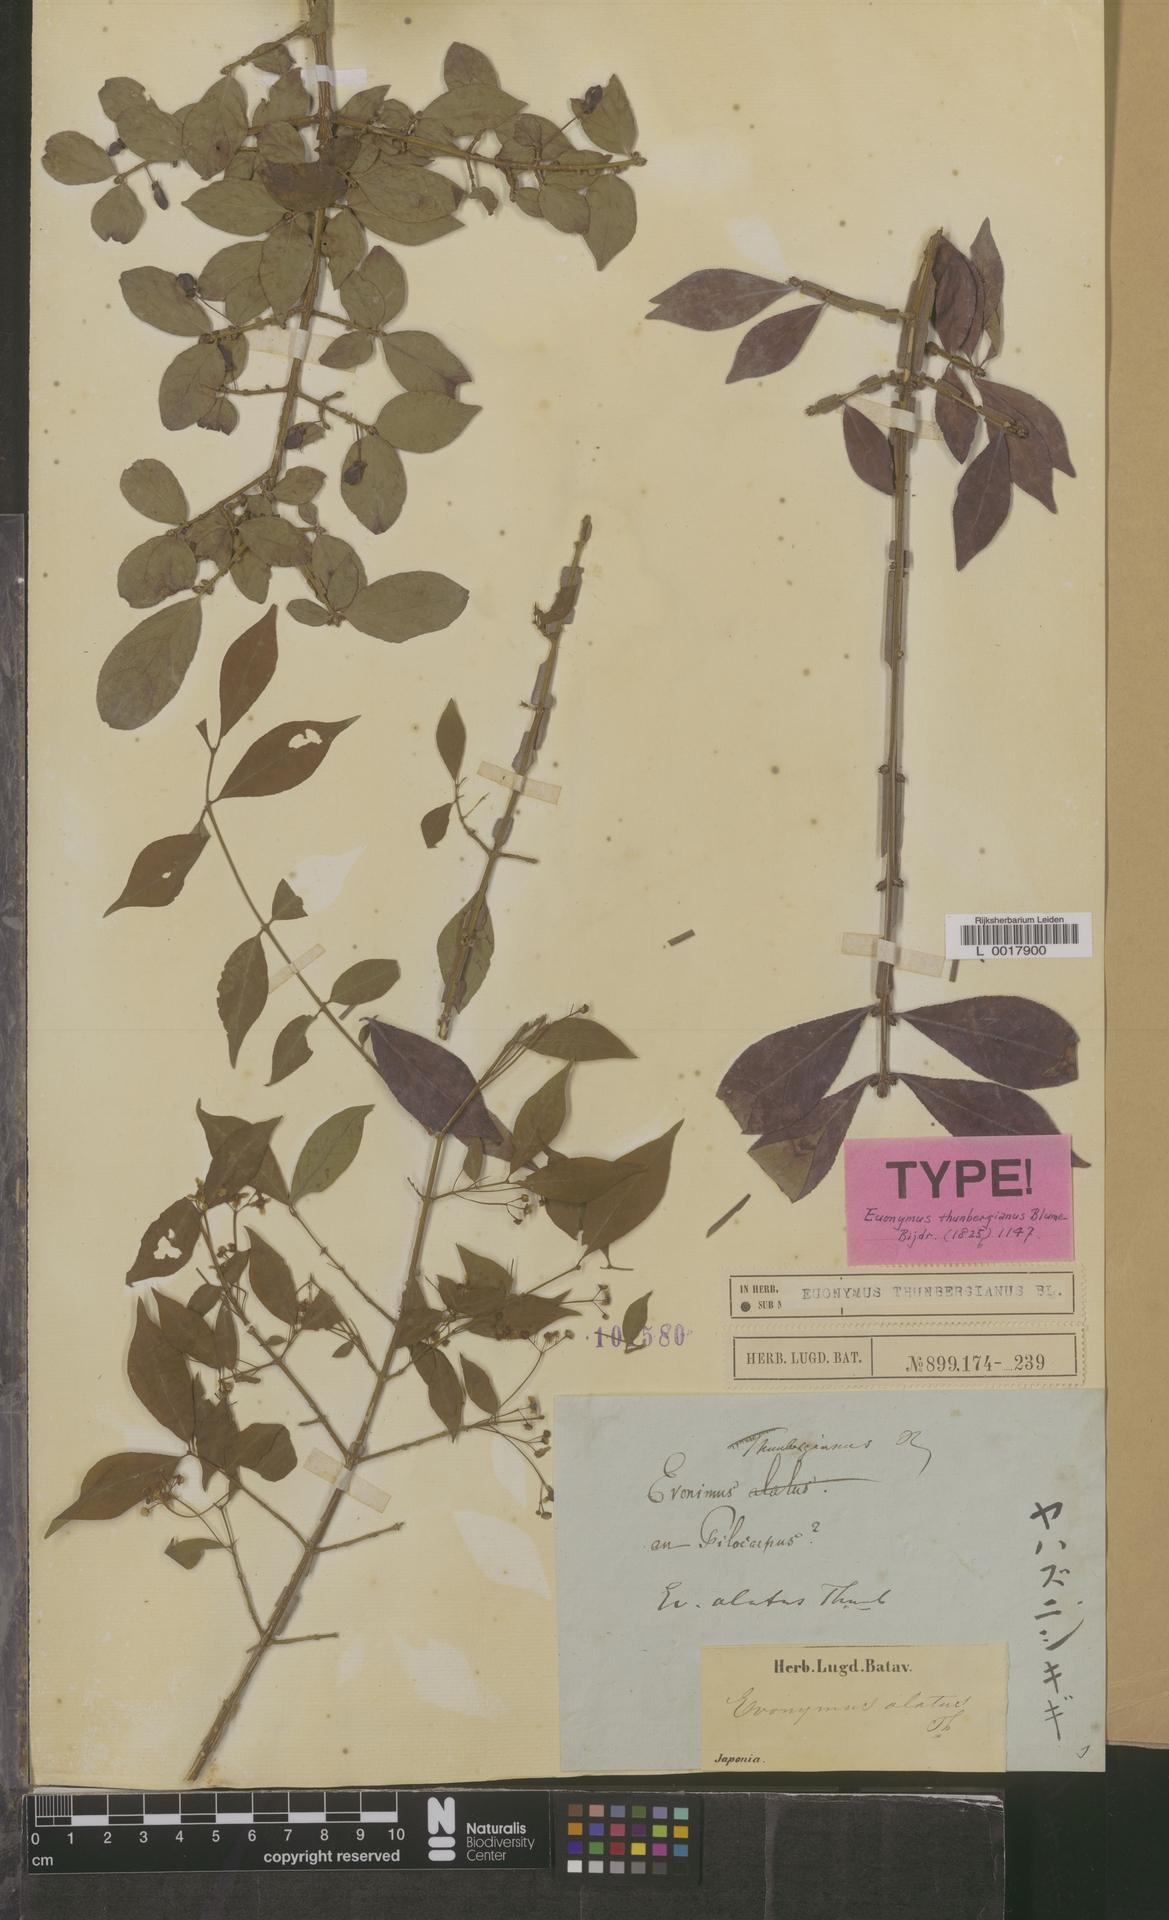 L  0017900 | Euonymus thunbergianus Blume